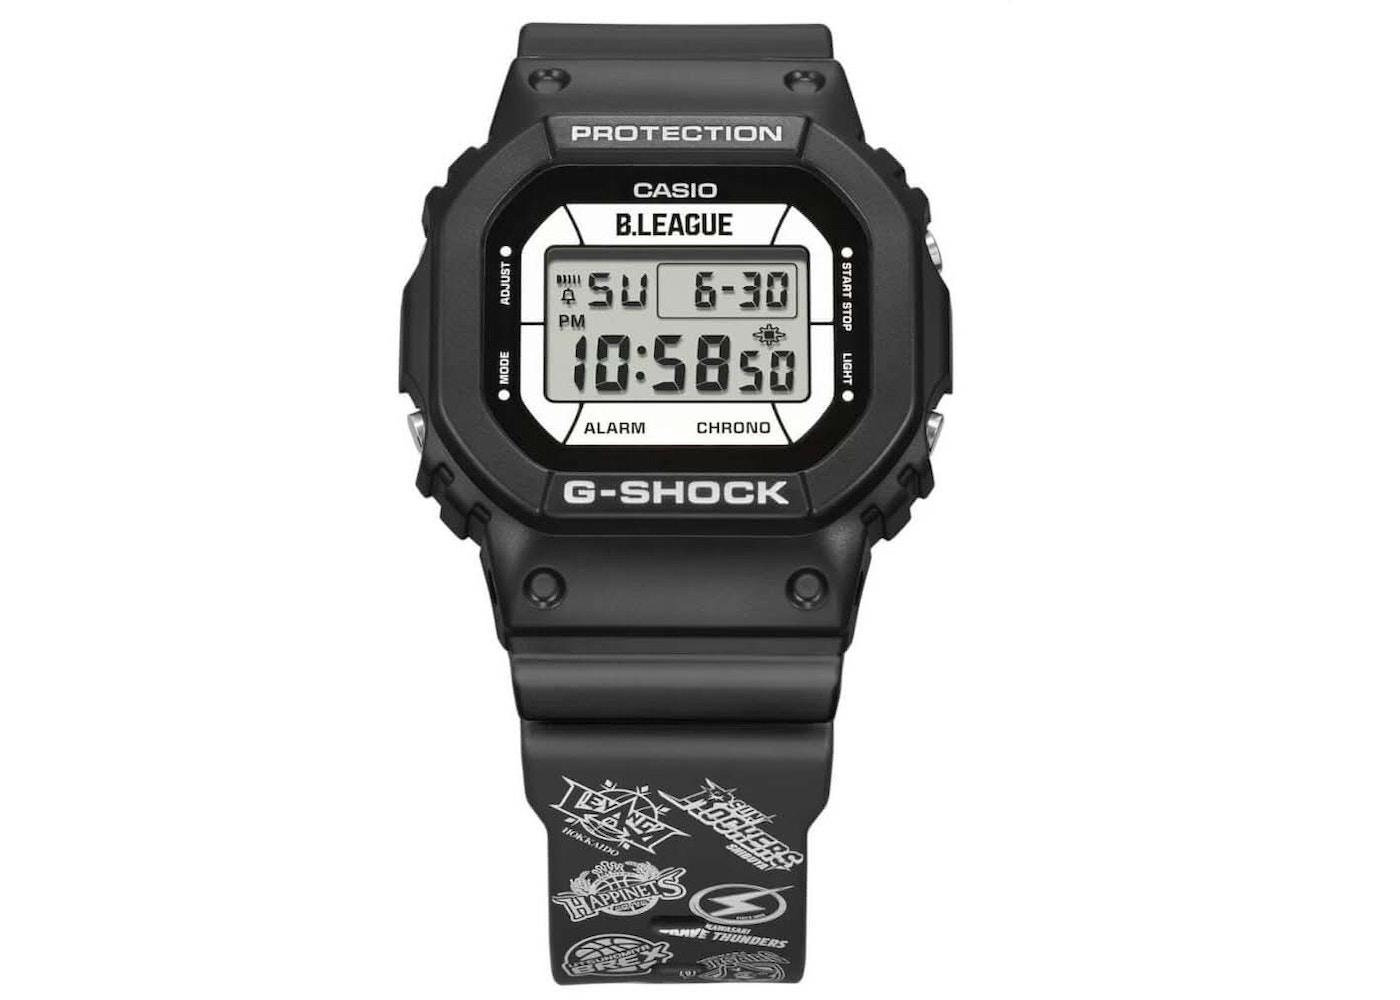 Casio G-Shock x B.League DW-5600BLG21-1JR - 43mm in Resin